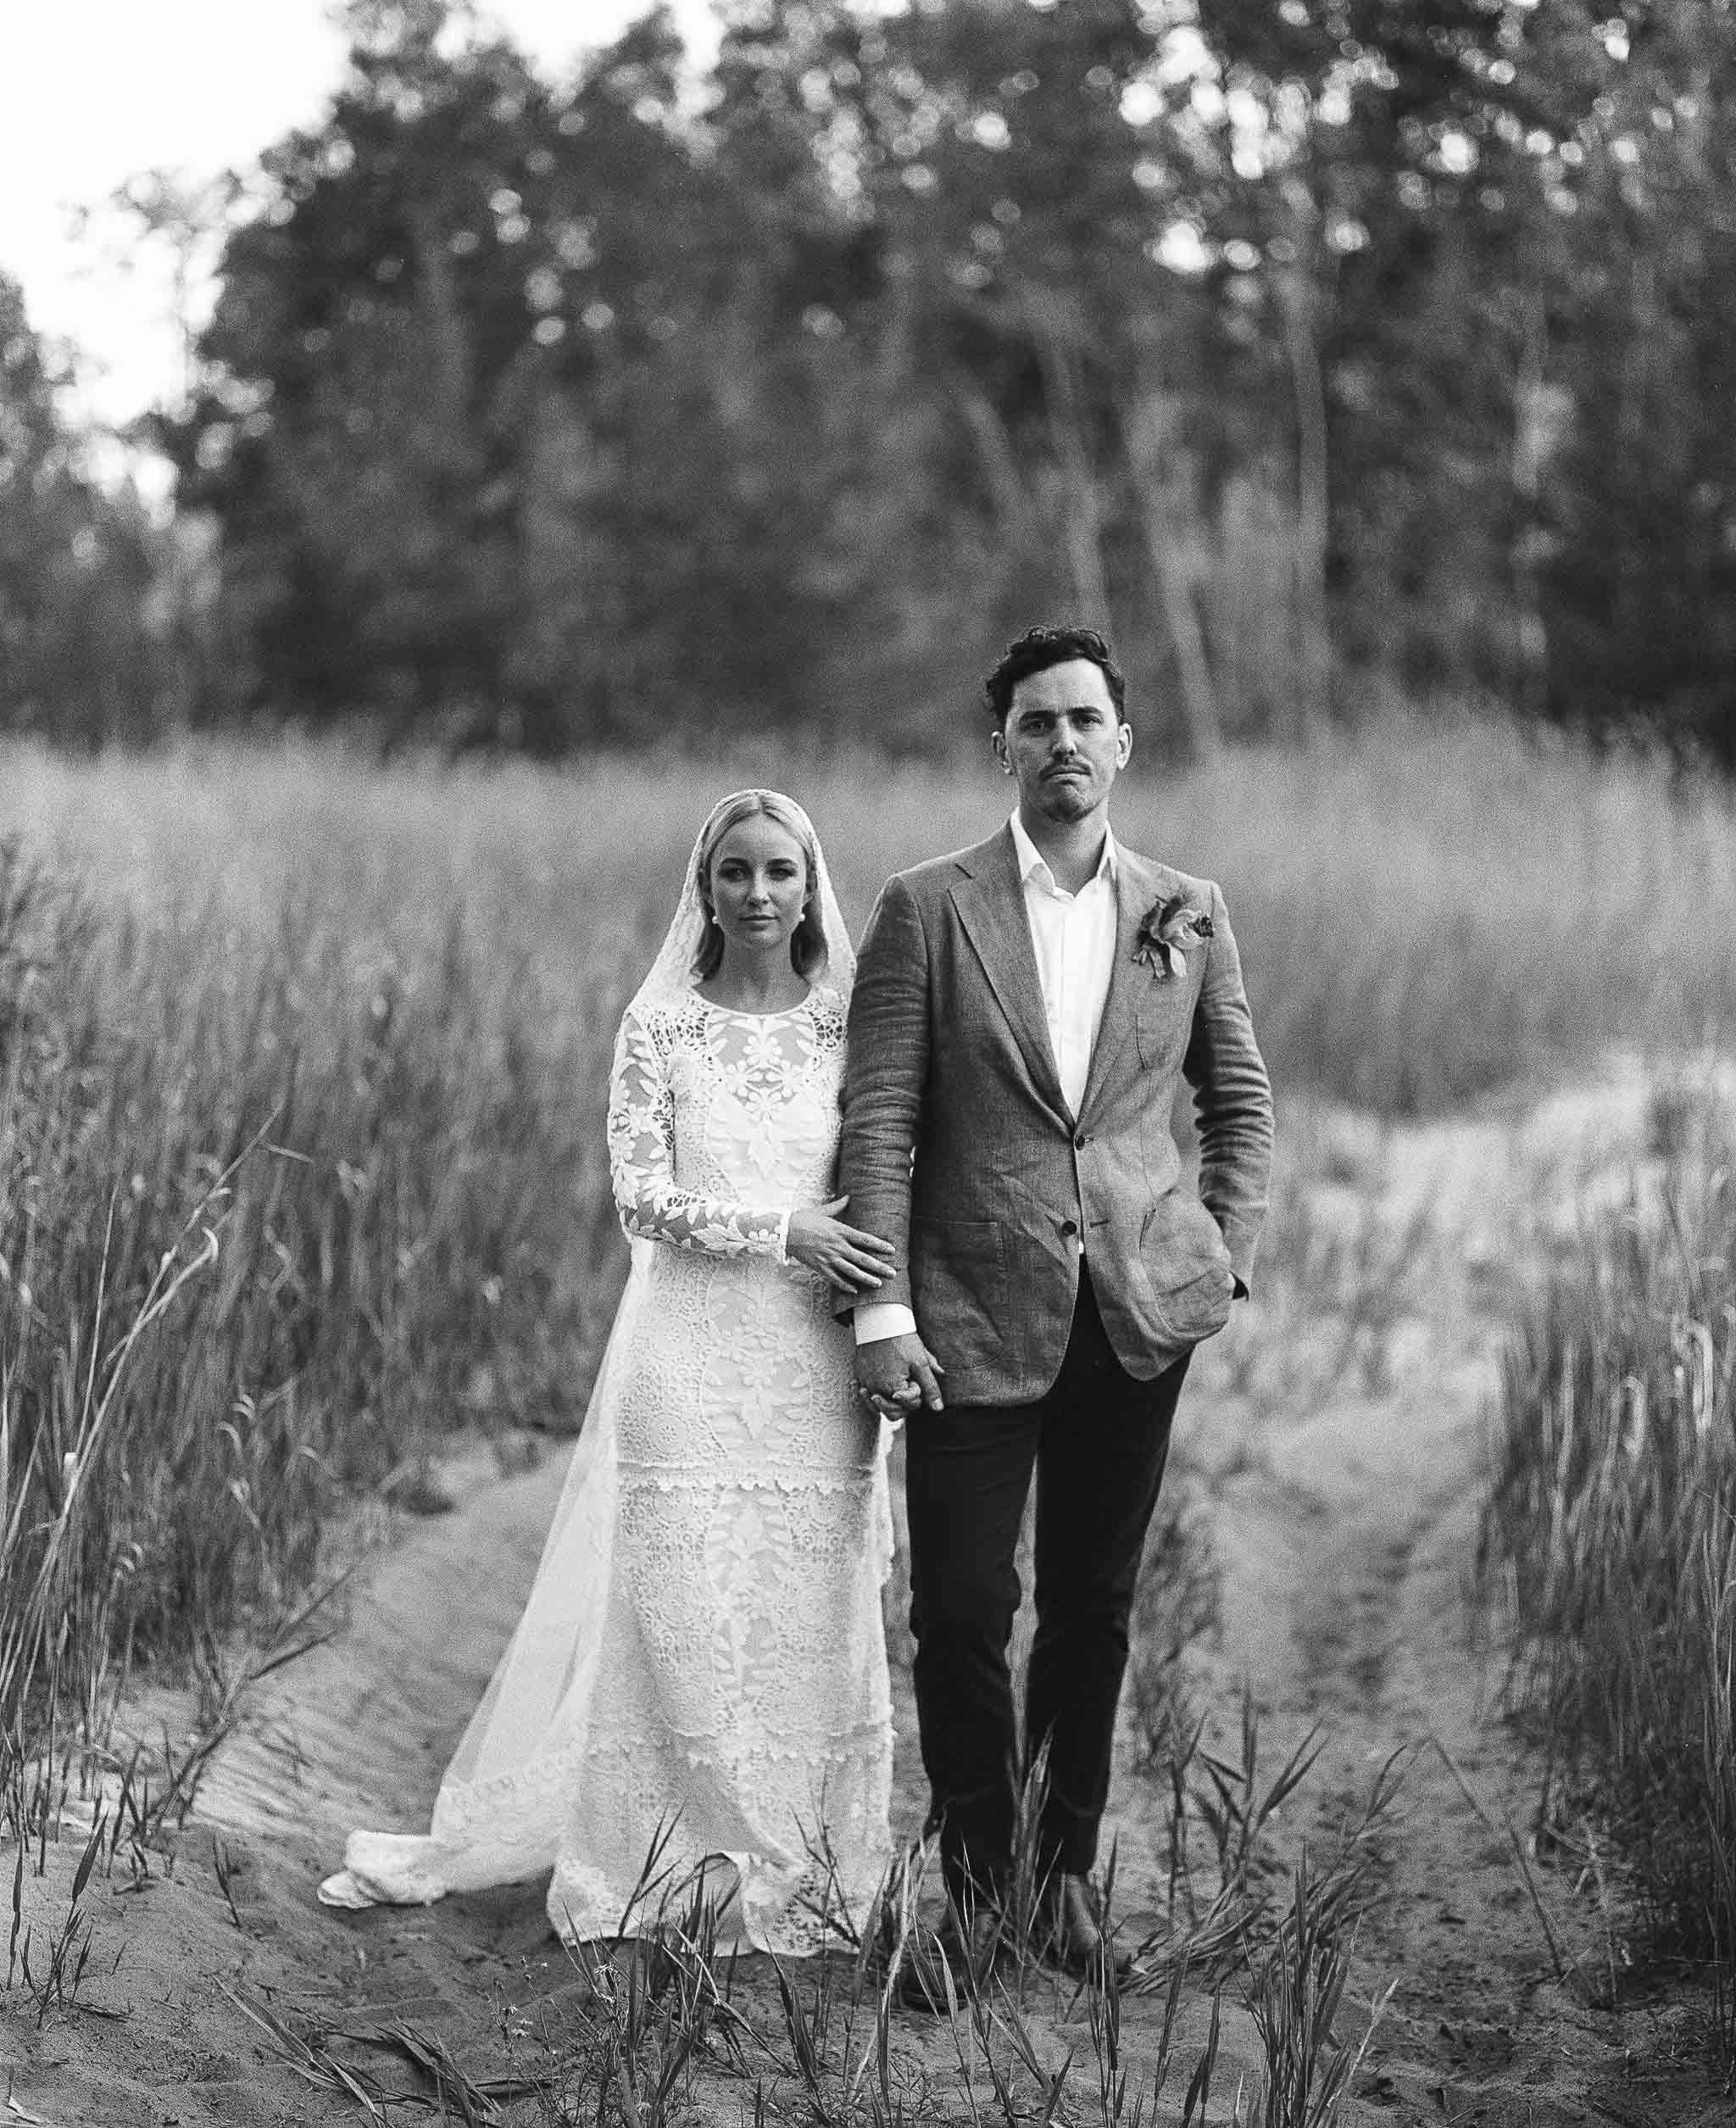 ben_bree_film_analog_photographer_wedding-7.jpg